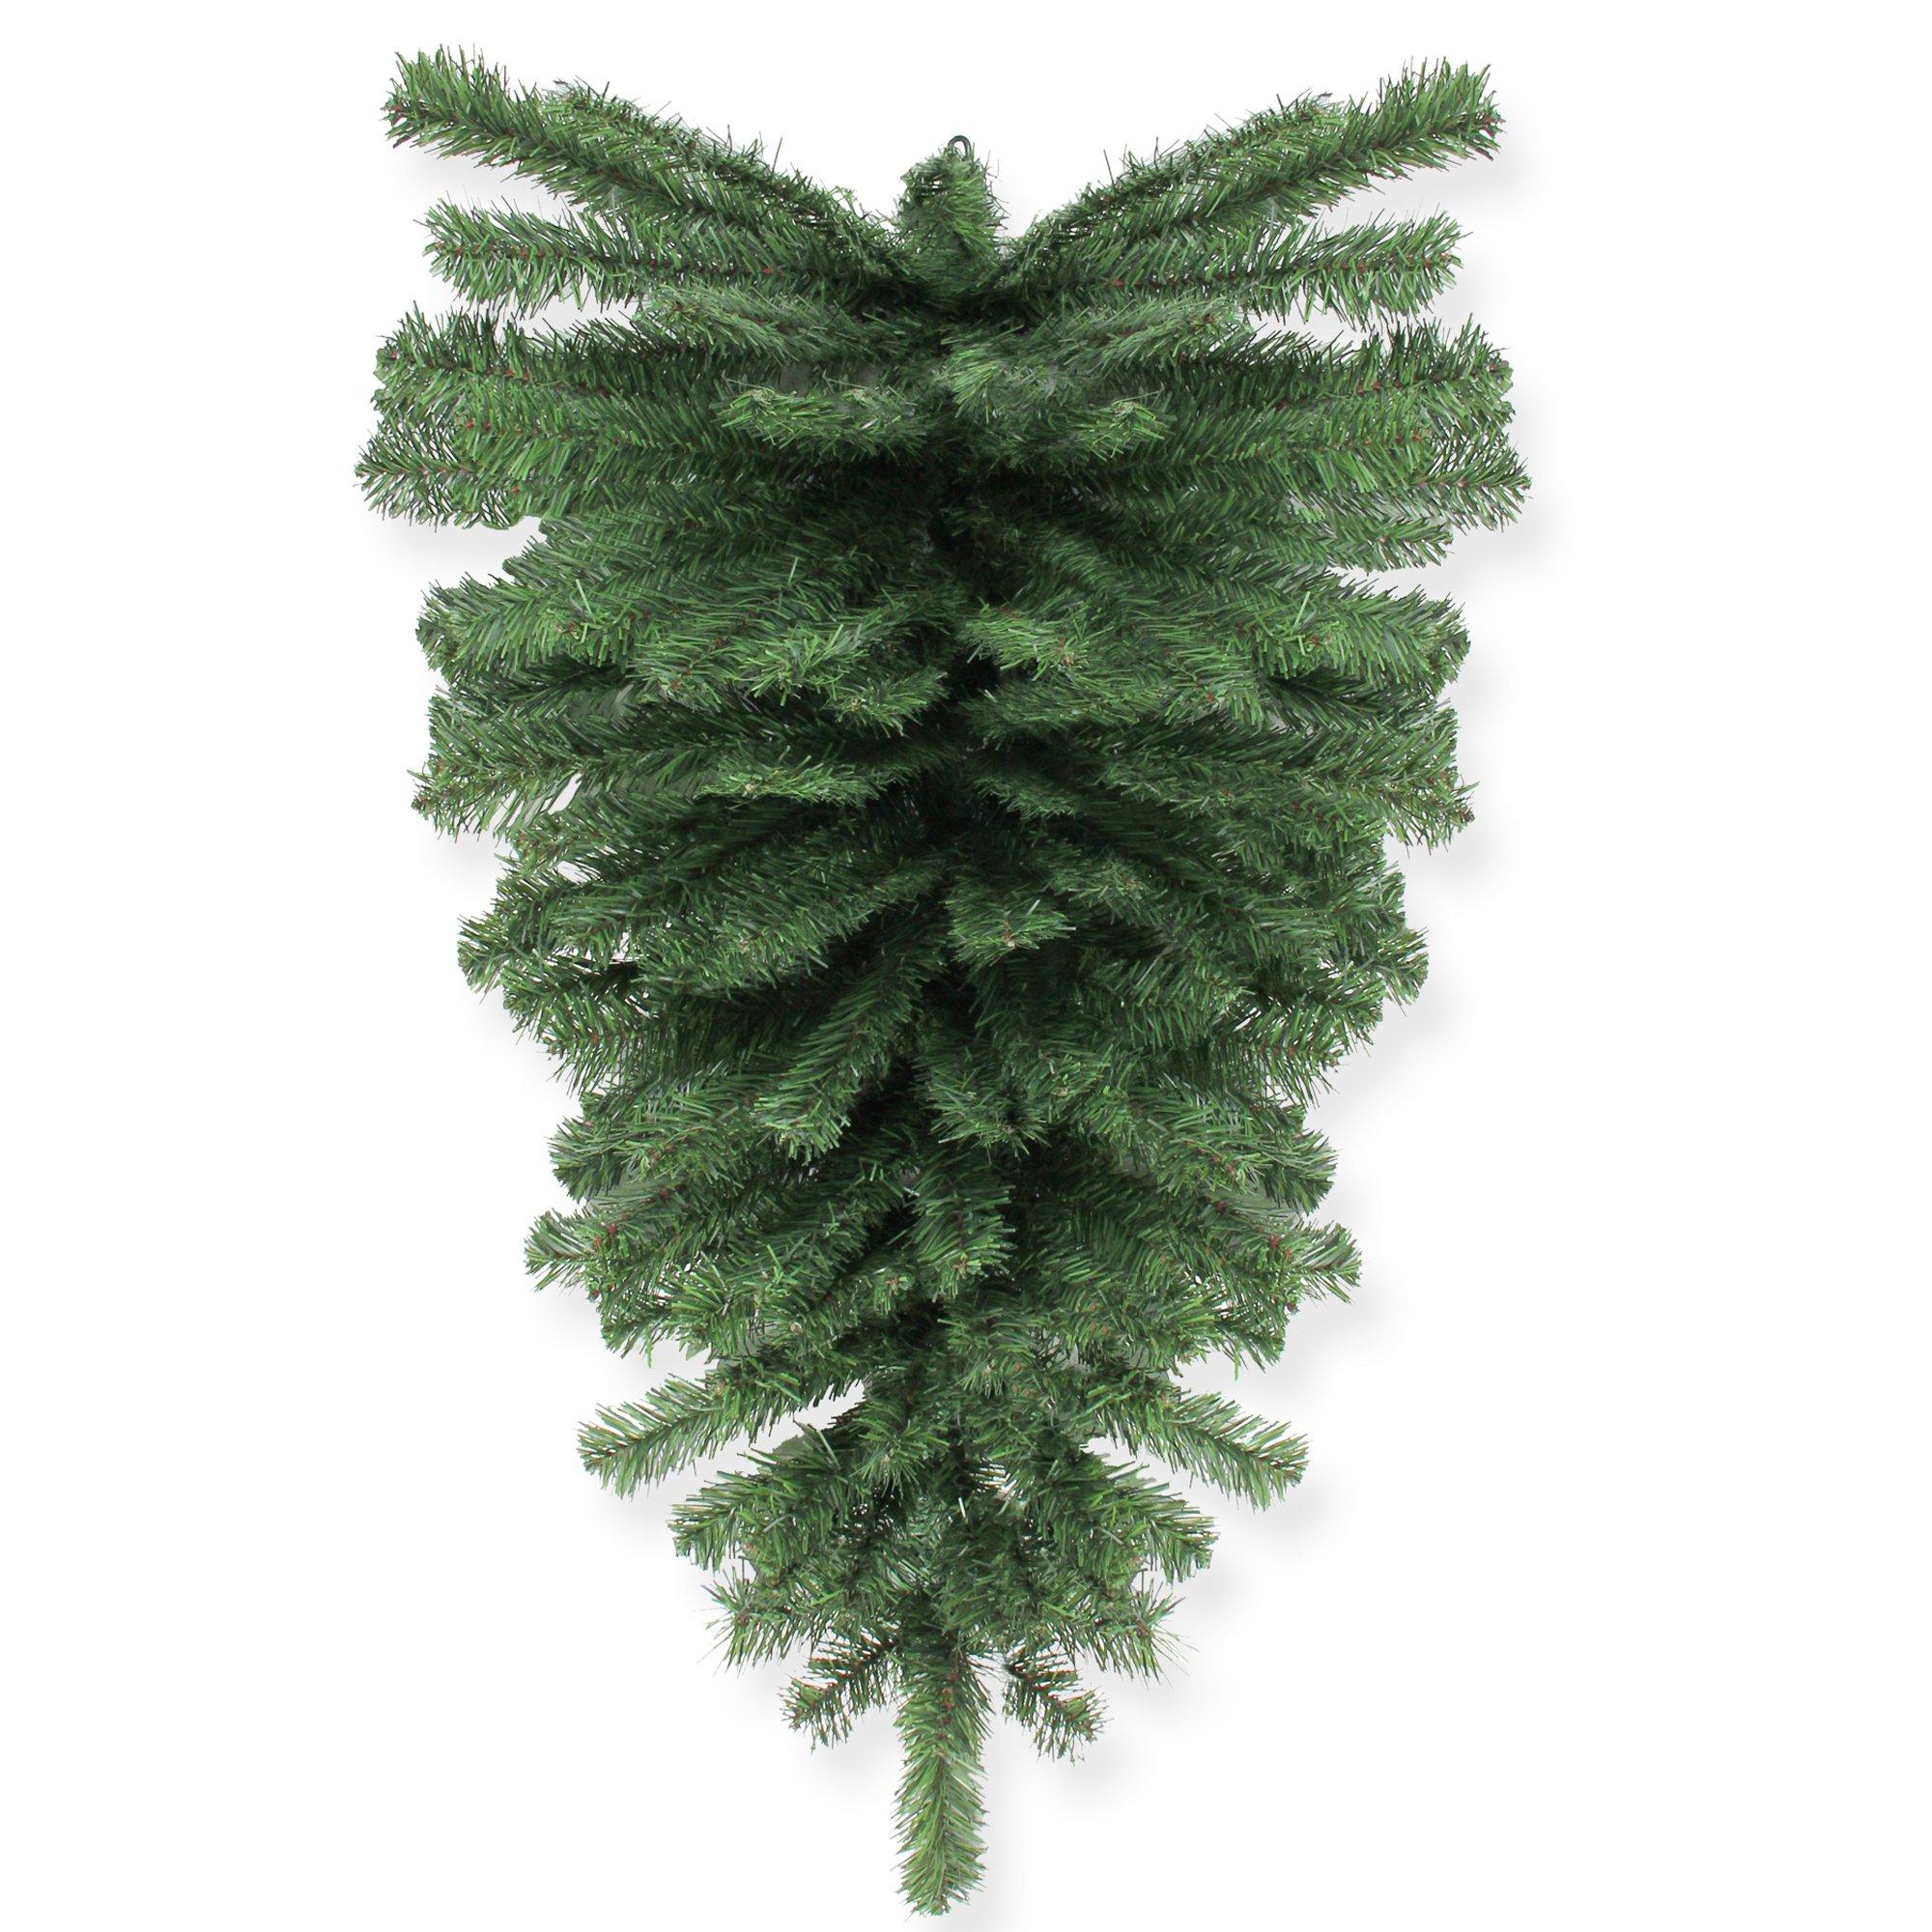 Northlight 32'' Canadian Pine Artificial Christmas Teardrop Swag - Unlit